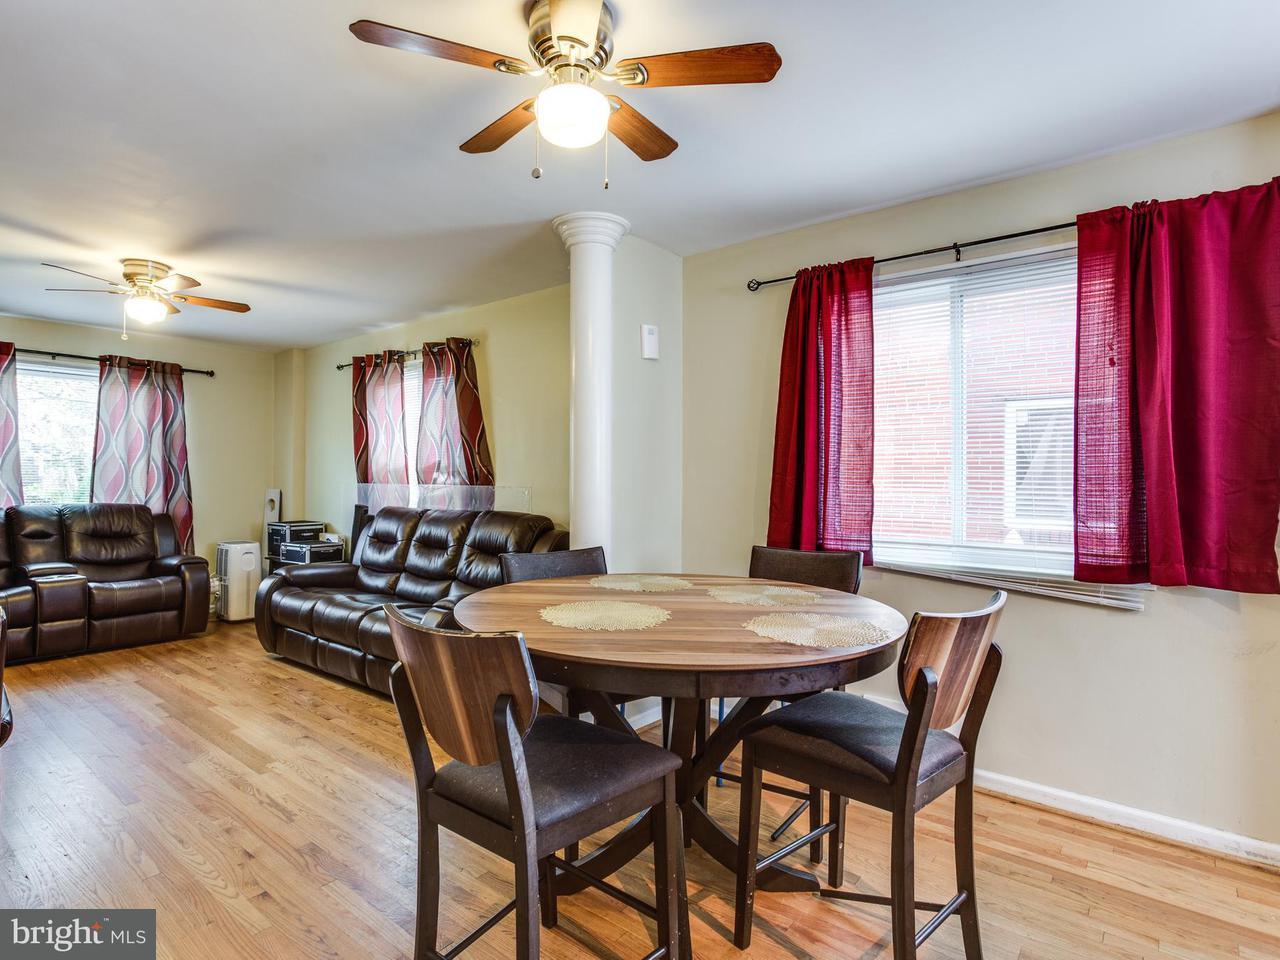 Additional photo for property listing at 5024 14th St Ne 5024 14th St Ne Washington, Округ Колумбия 20017 Соединенные Штаты